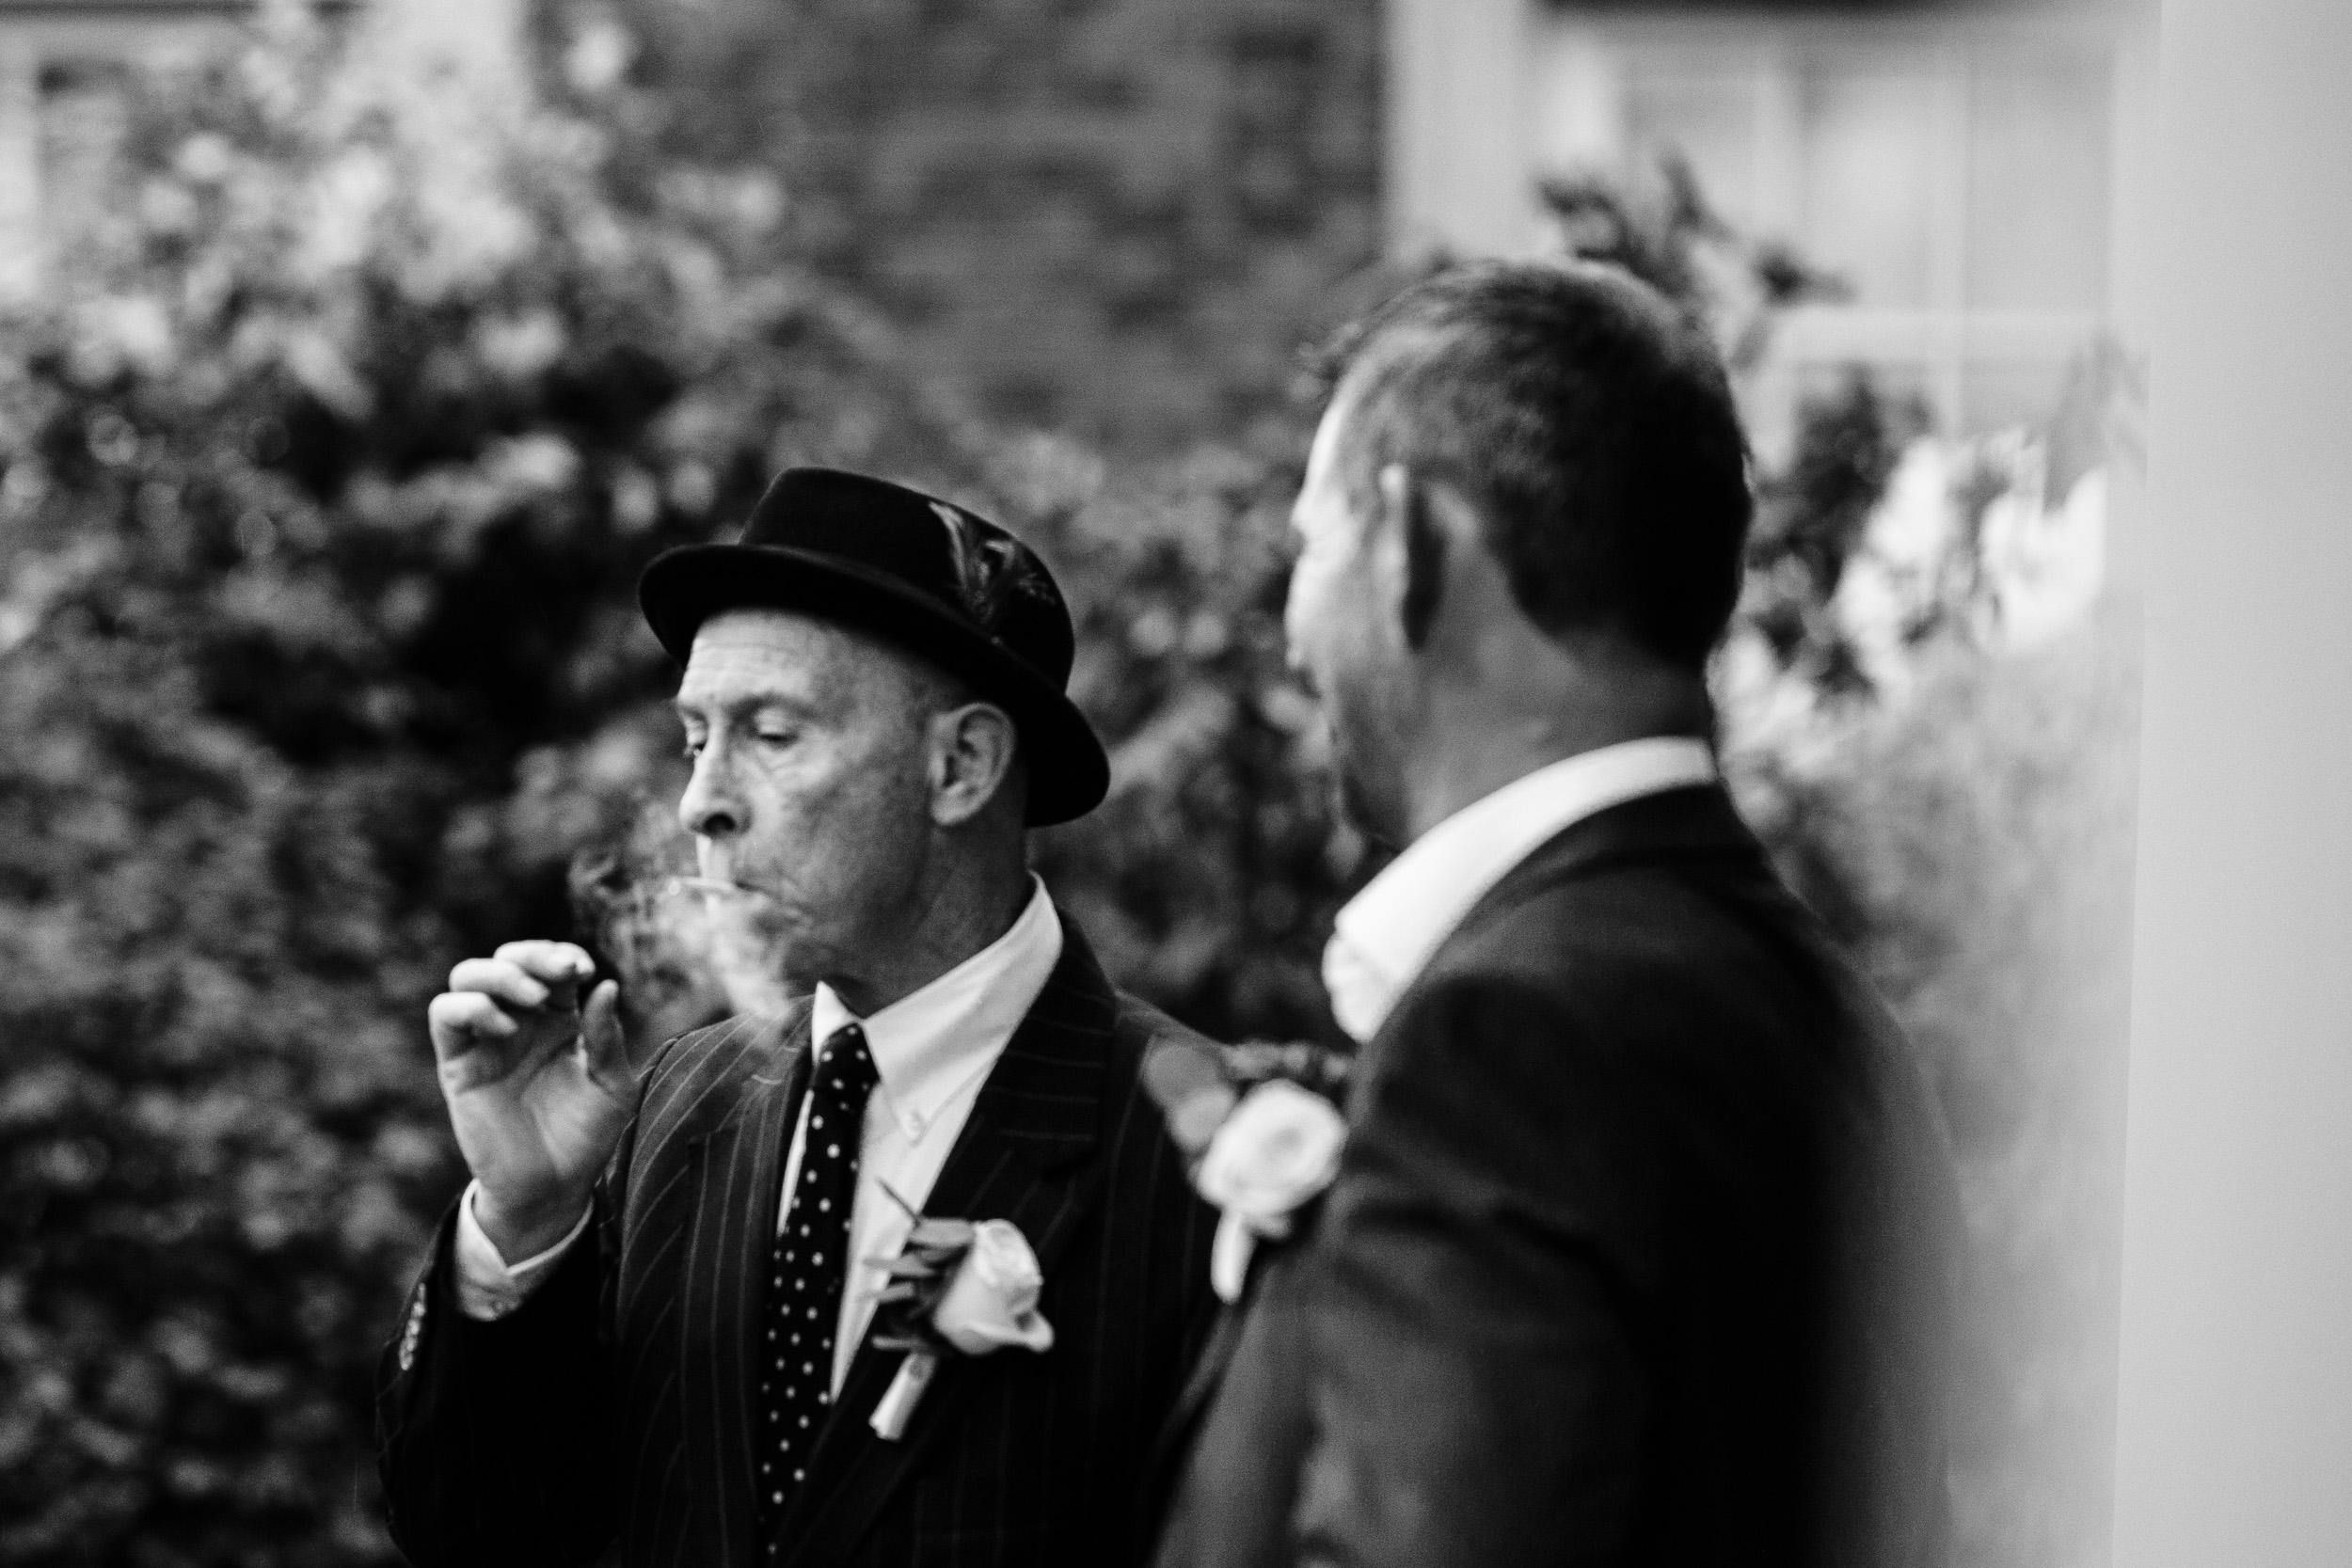 Cardiff Photographer Alex Sedgmond - Photography South Wales - Cardiff Wedding Photography-4.jpg